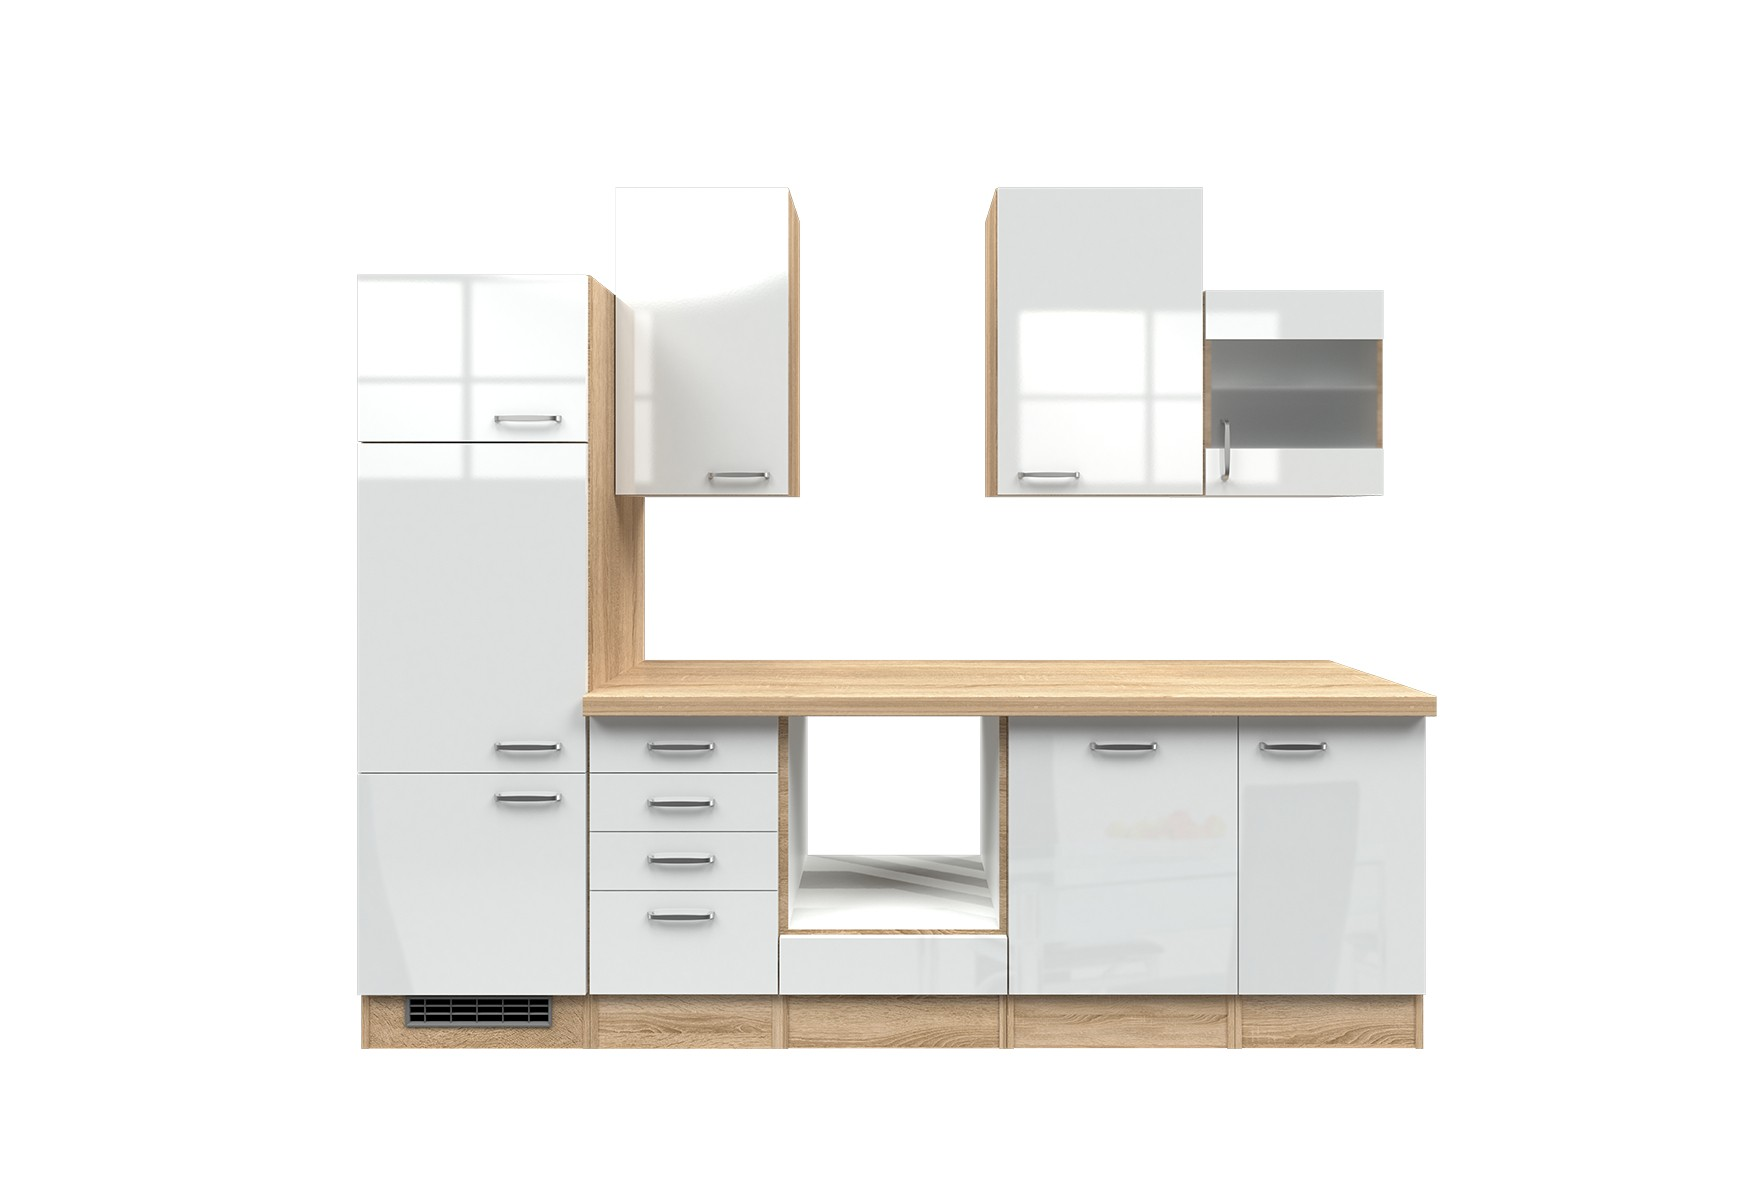 k chenzeile venedig k chen leerblock breite 280 cm. Black Bedroom Furniture Sets. Home Design Ideas